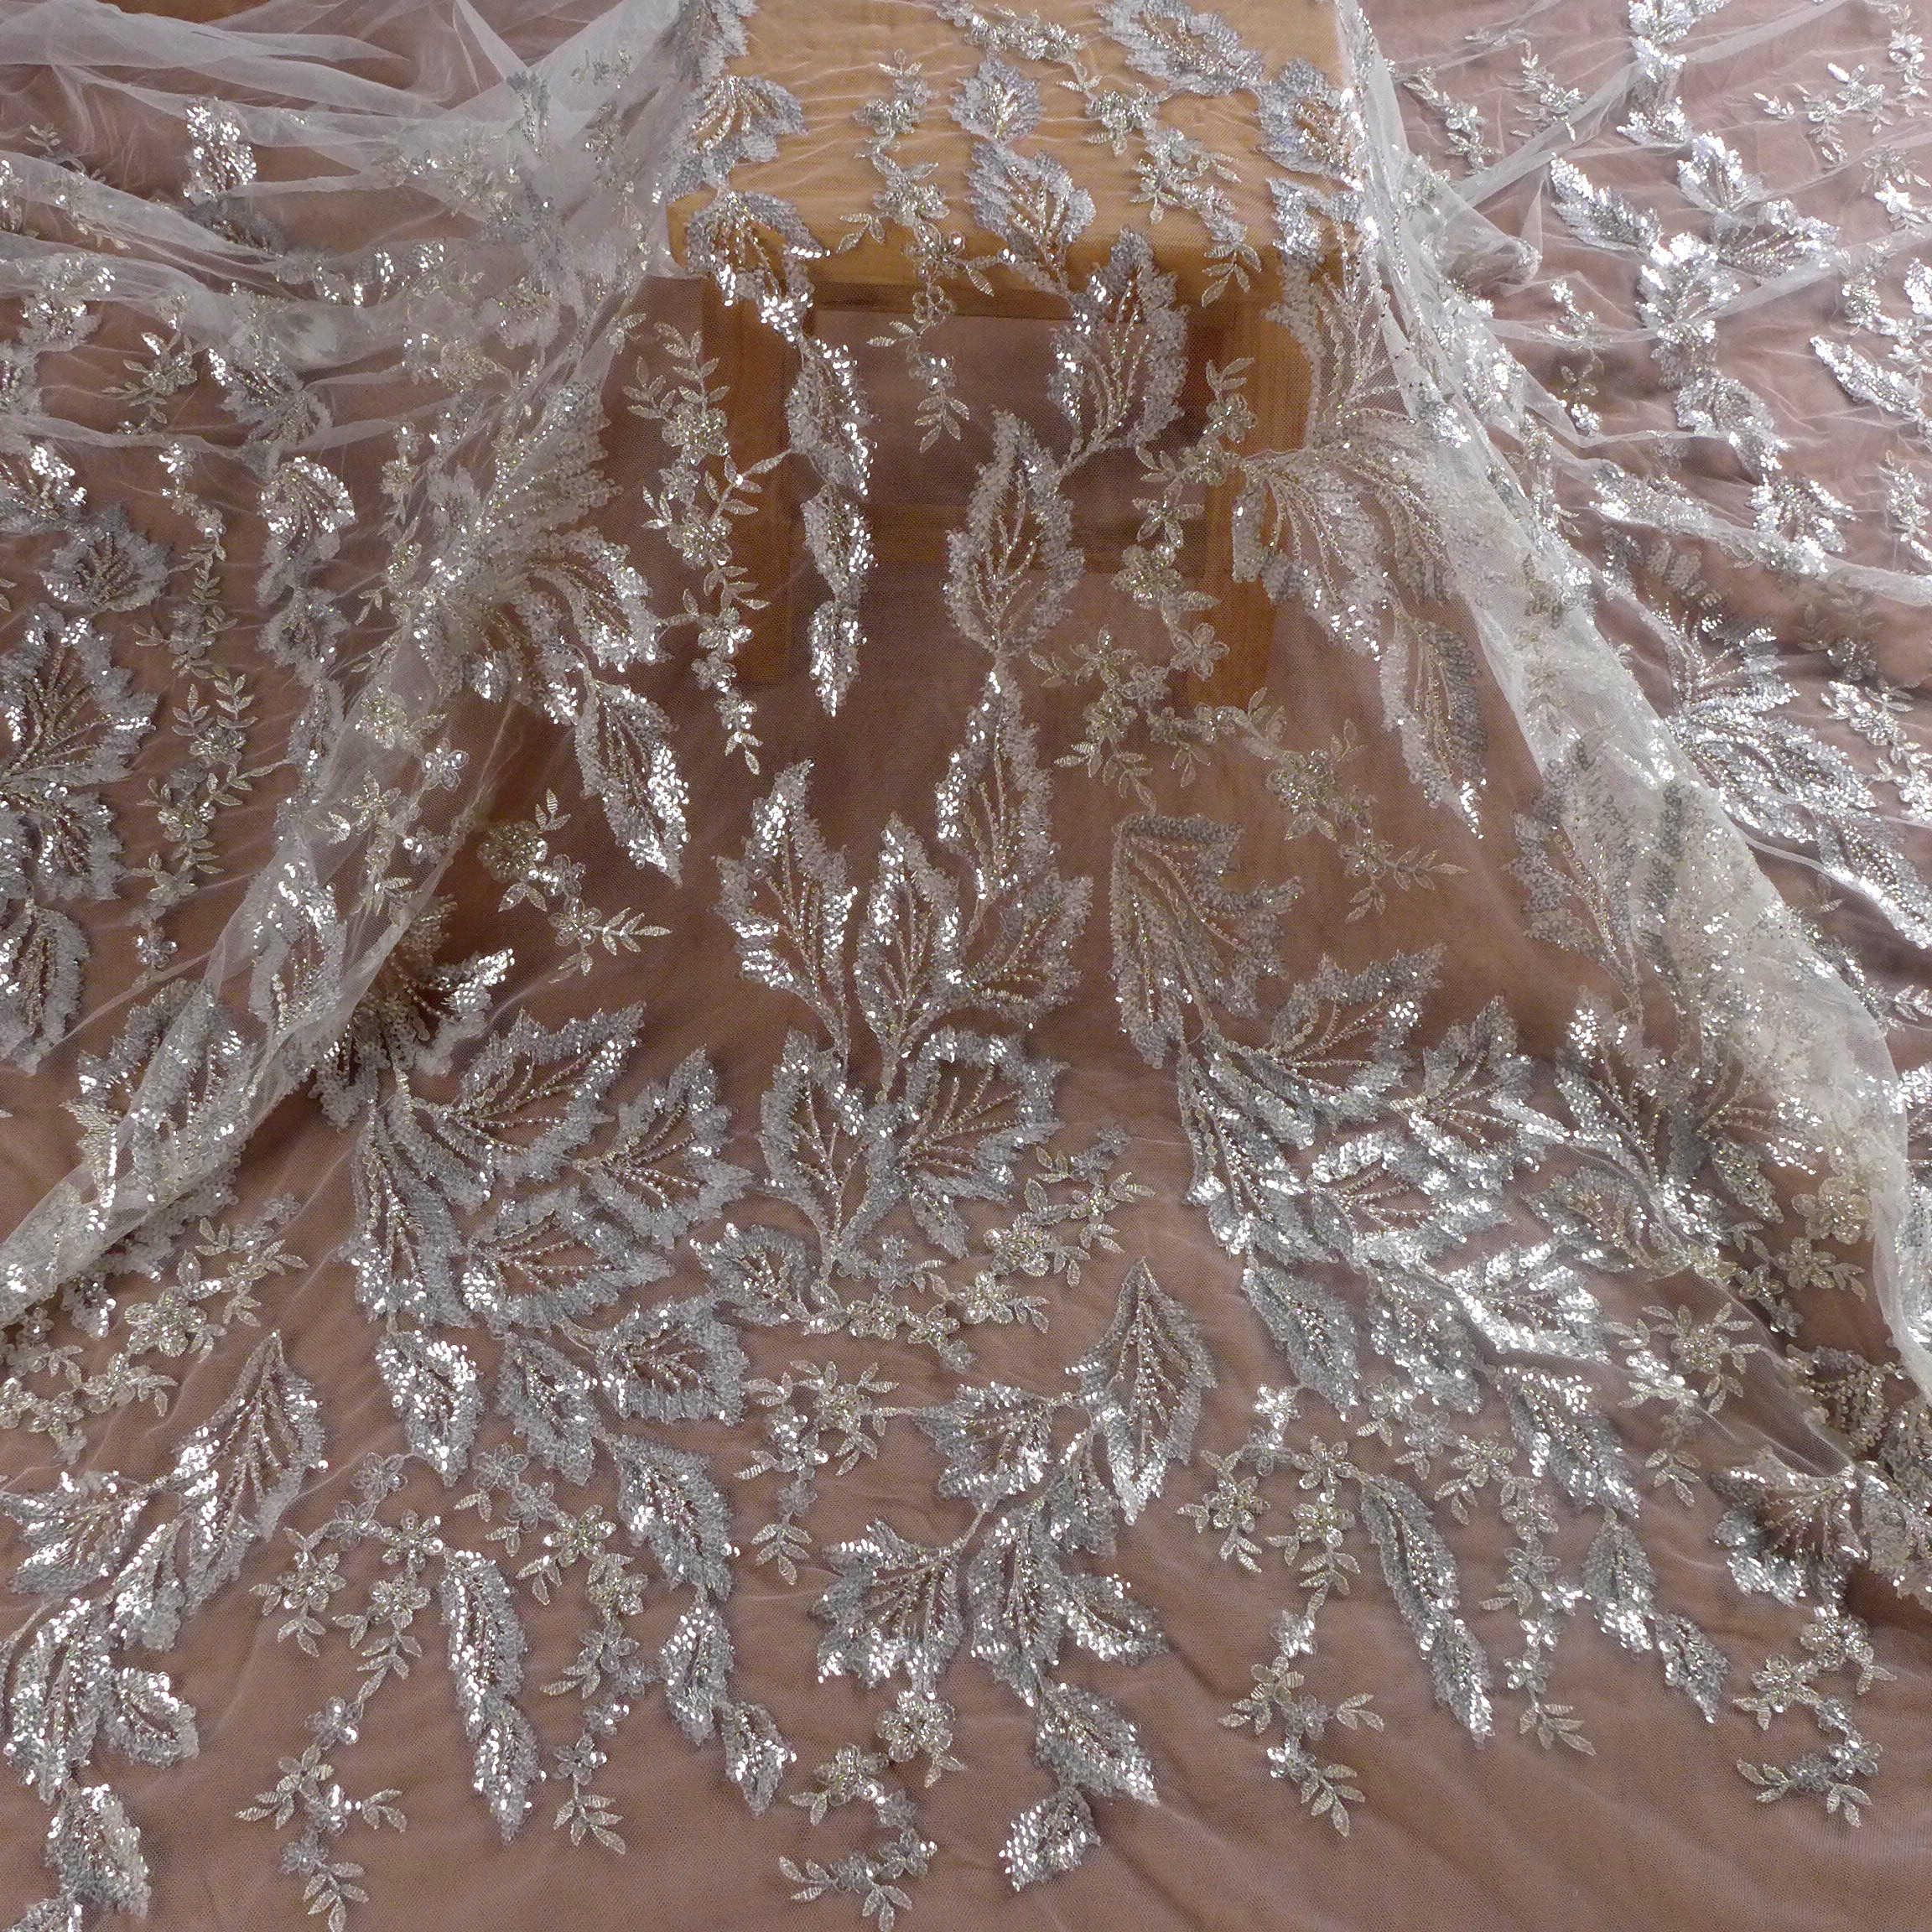 La Belleza ใหม่ sequins ลูกปัดชุดแต่งงานลูกไม้ผ้าสีขาวลูกปัดลูกไม้ผ้าใบรูปแบบลูกไม้ 1 YARD